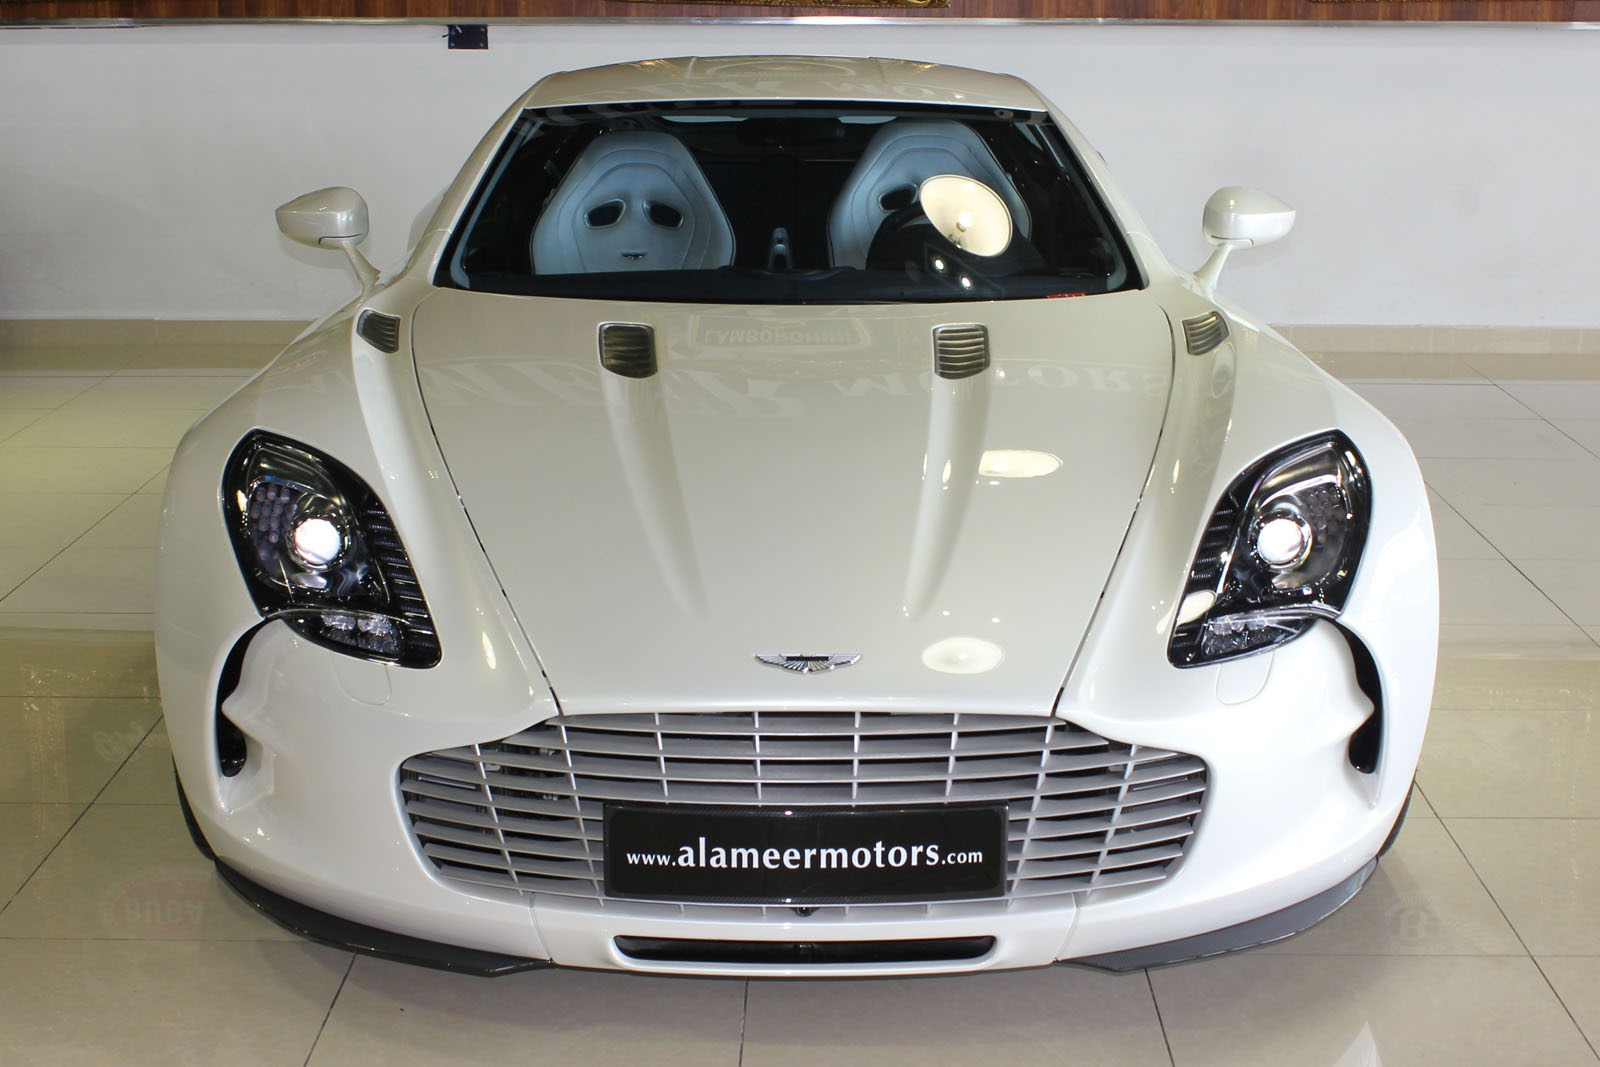 Aston-Martin-One-77-4%25255B3%25255D.jpg